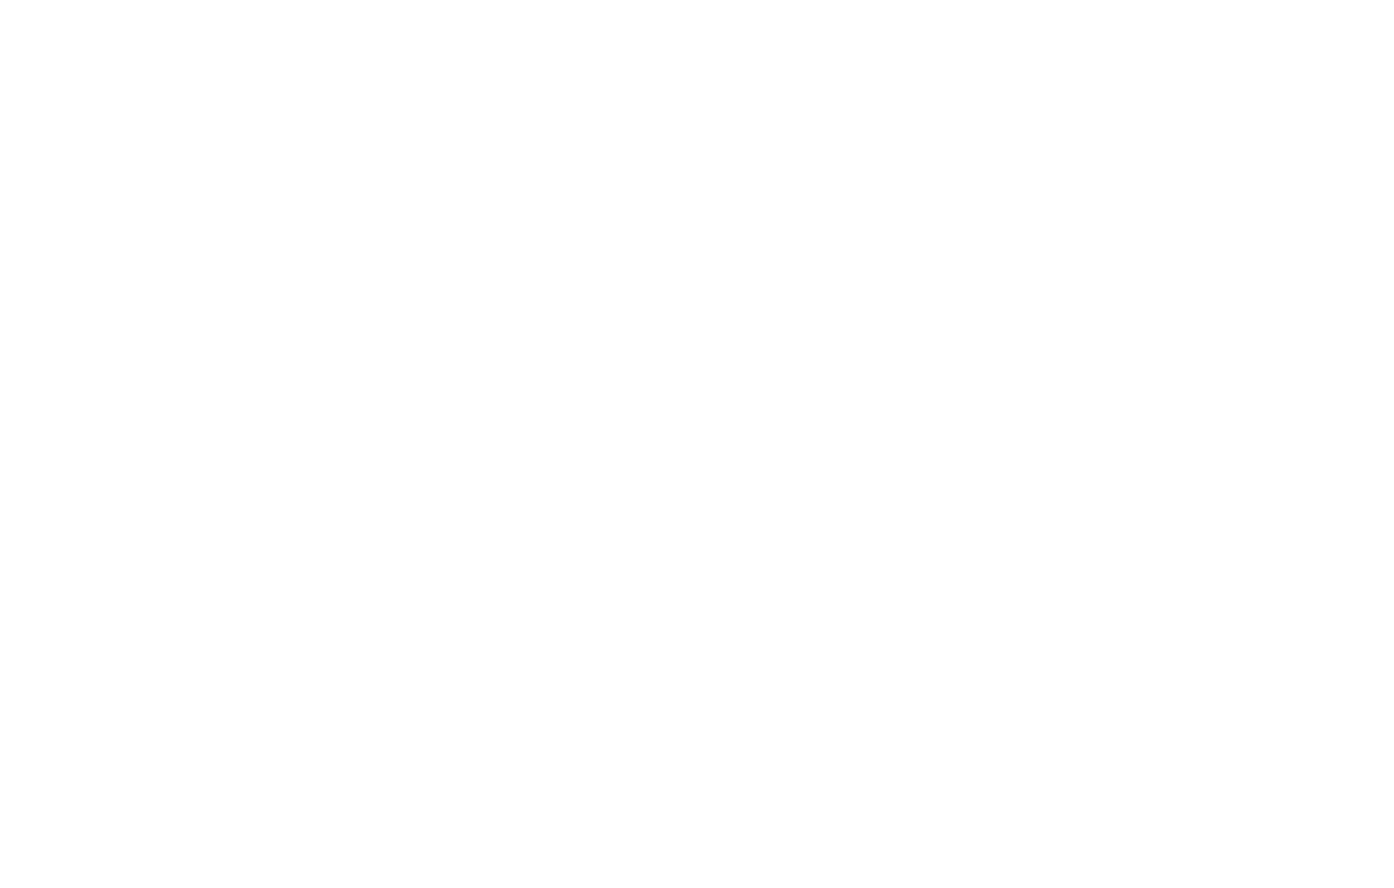 ESM_logo_redone_white.png